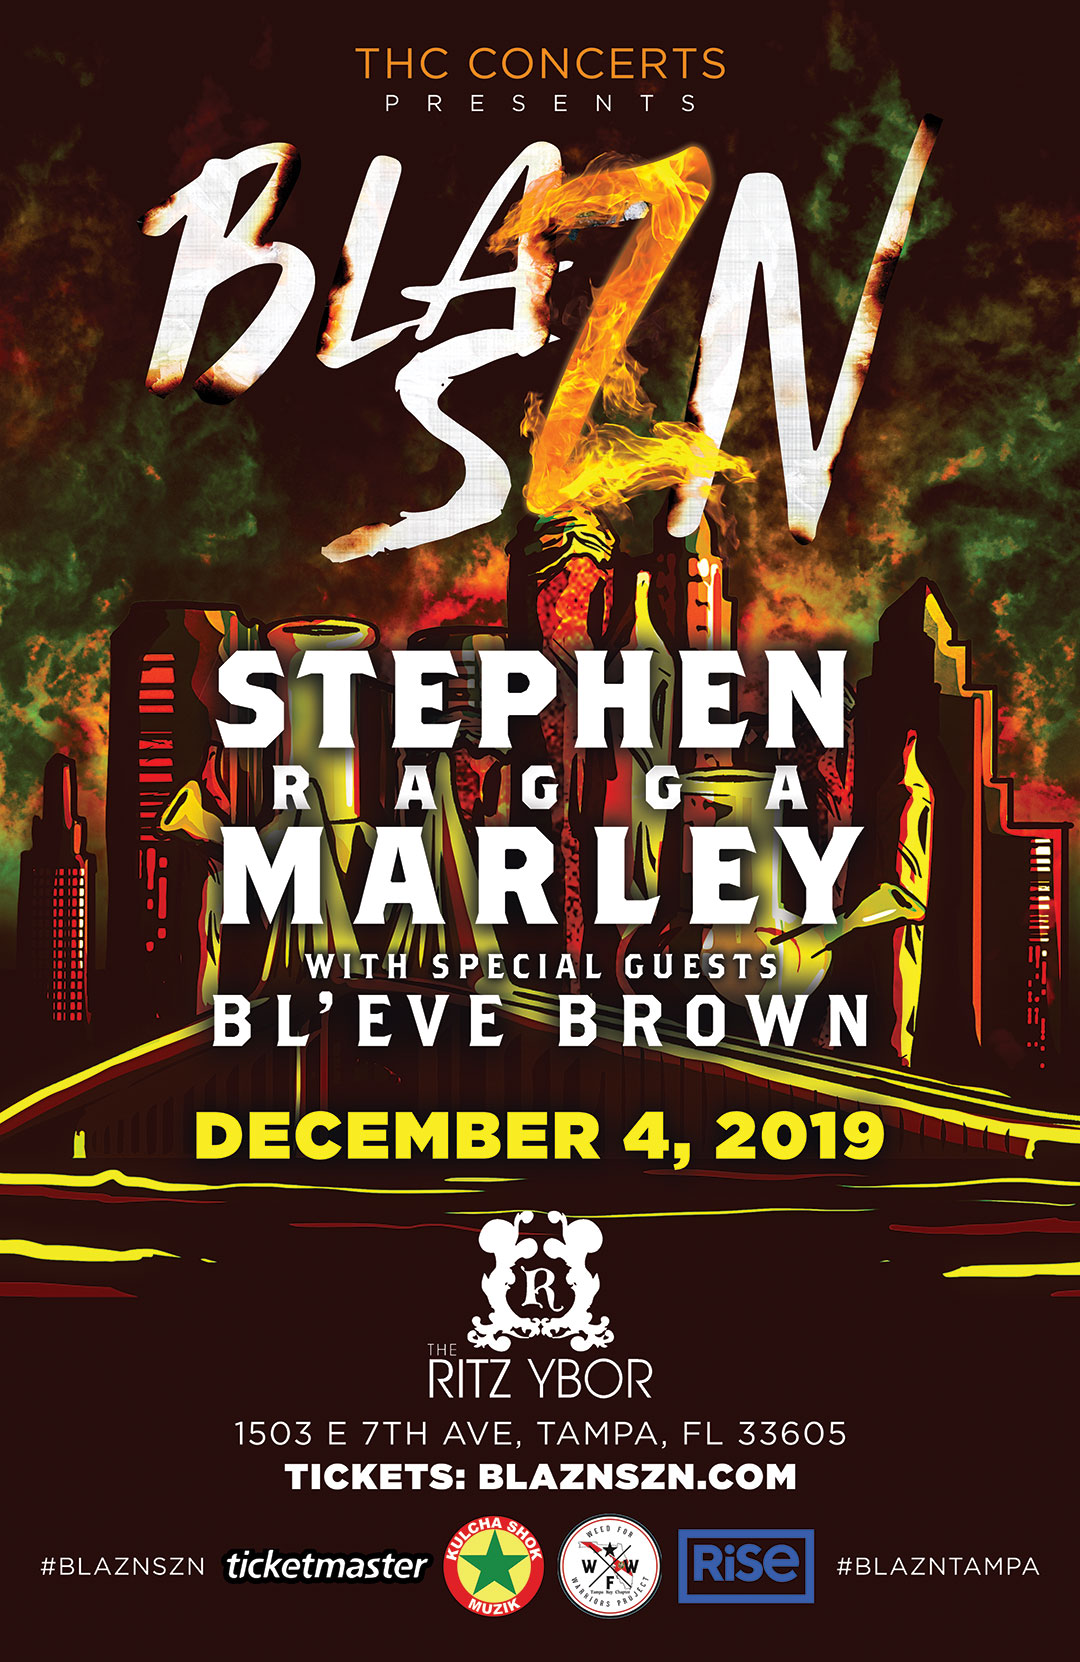 BLAZN SZN ft. Stephen Marley w/ Bl'eve Brown at The RITZ Ybor – 12/4/2019